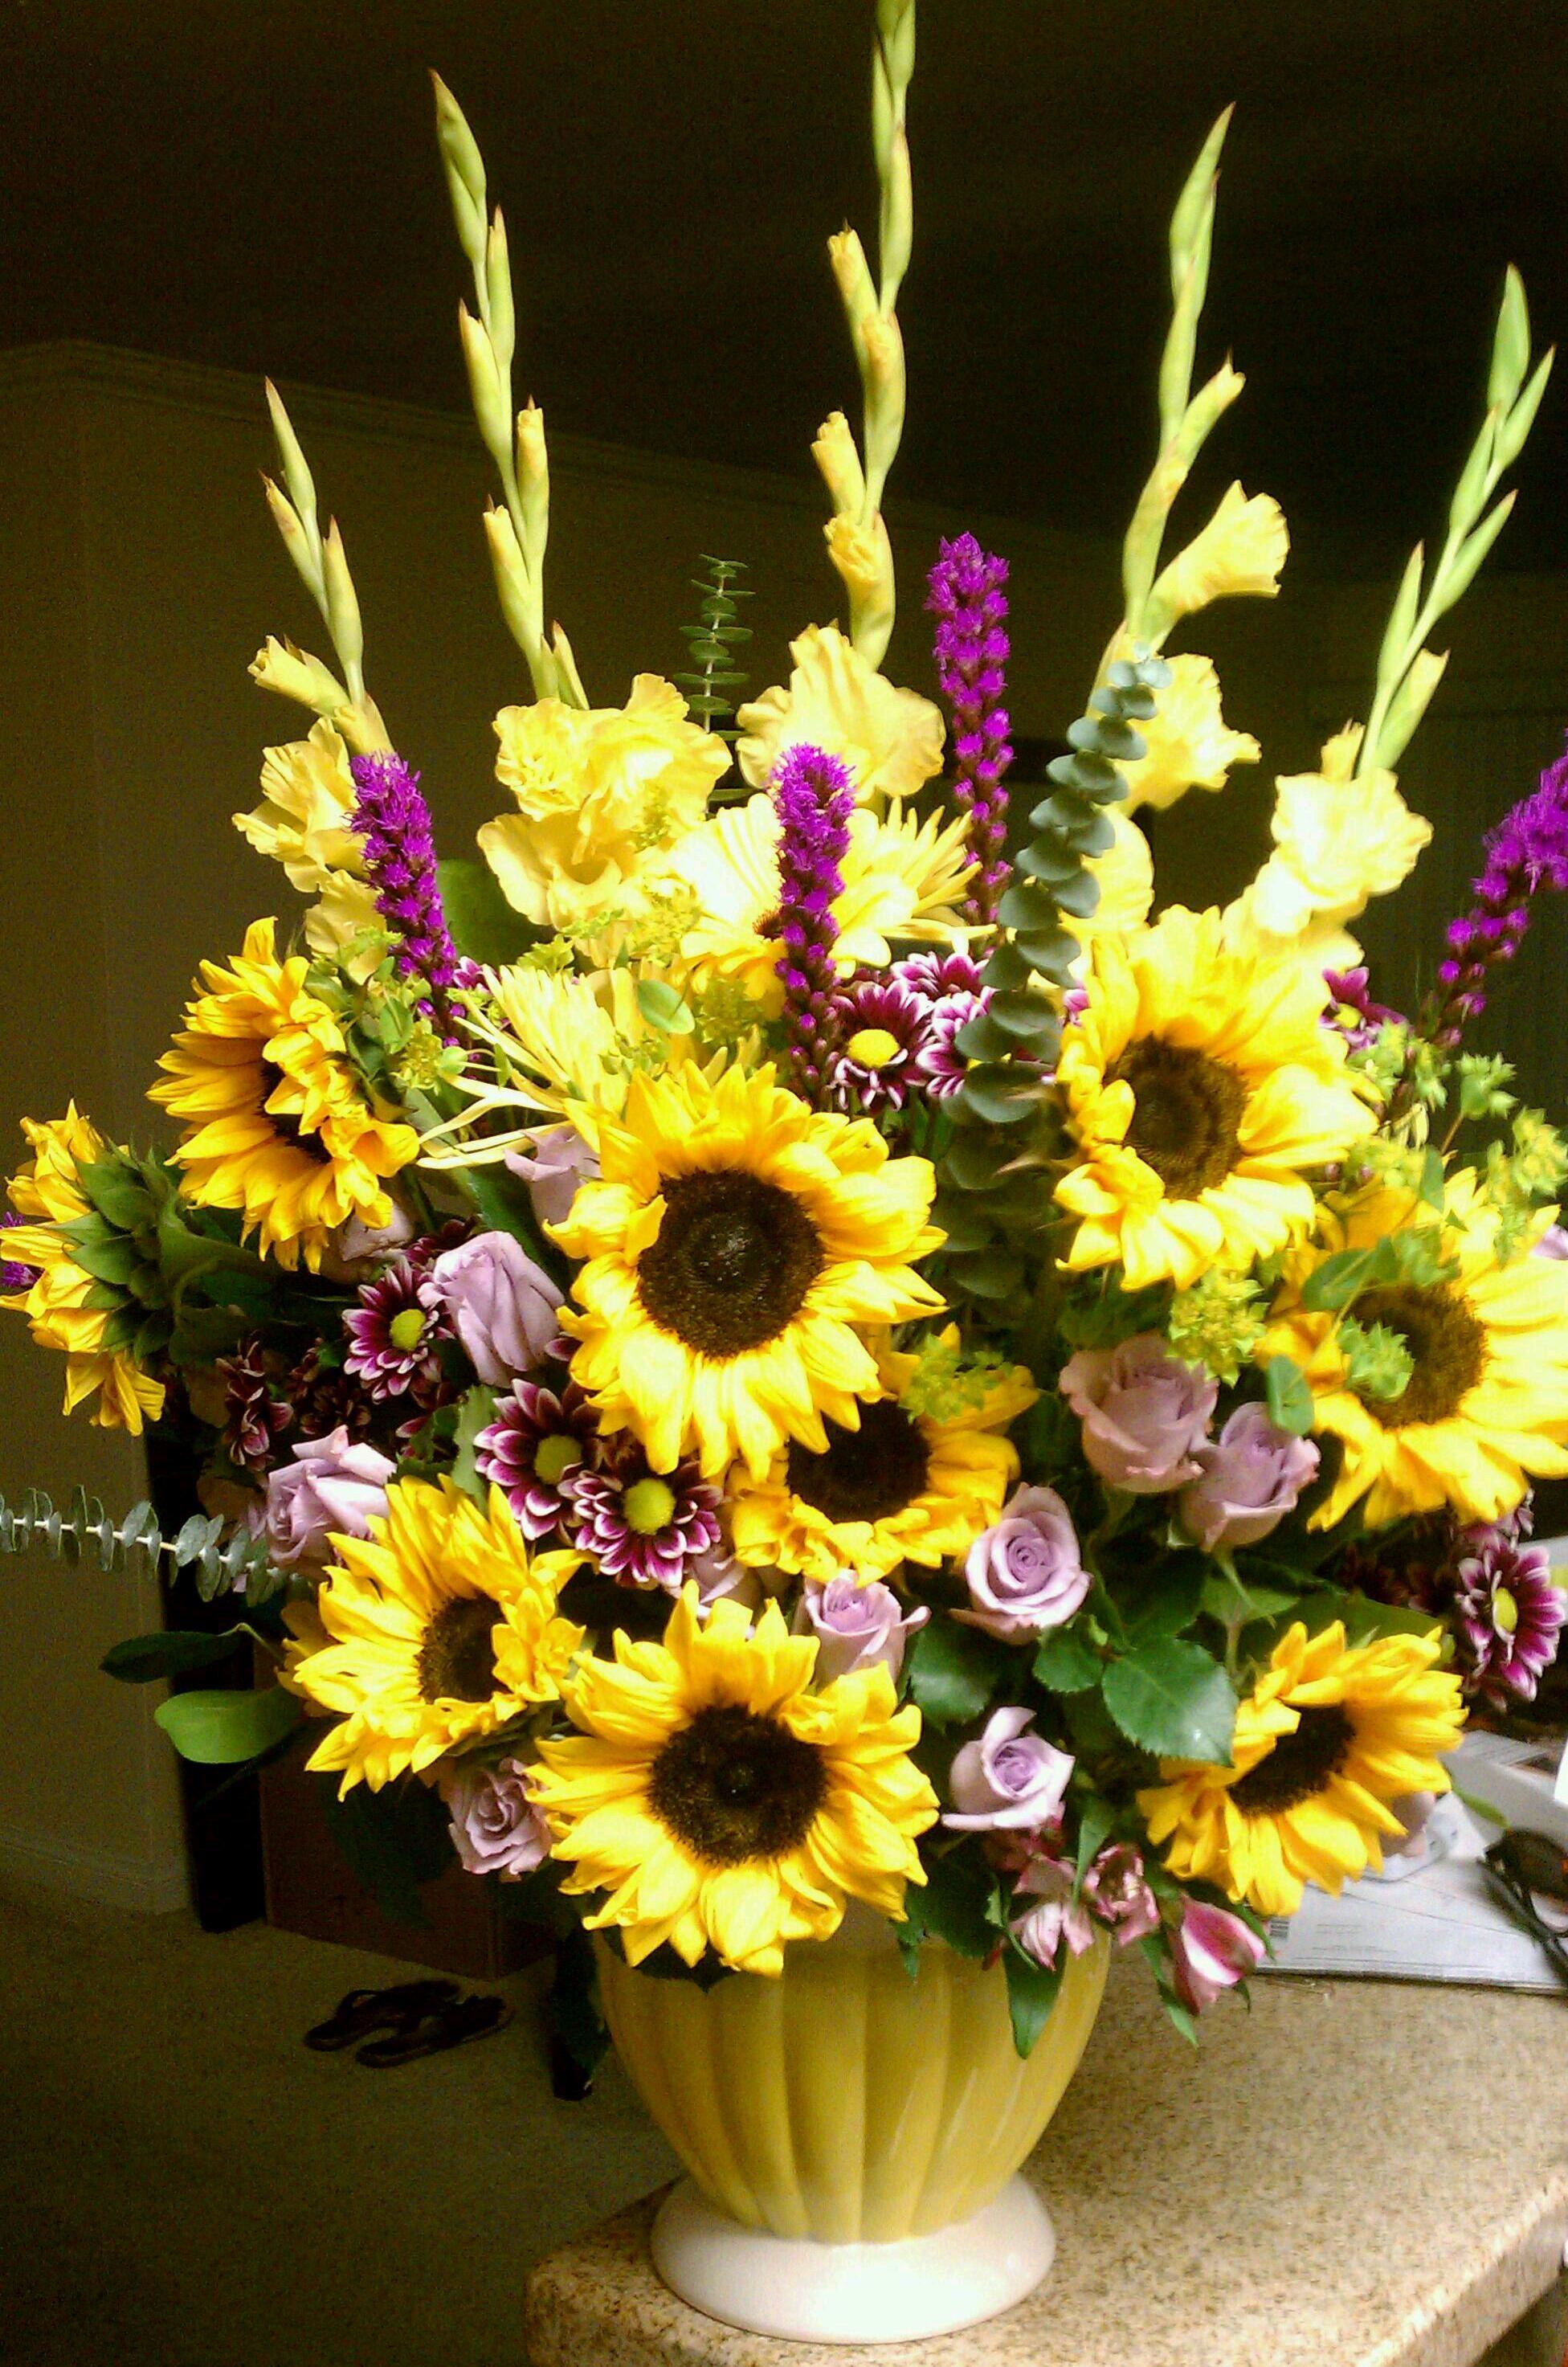 Sunflower Arrangement Floral Arrangements Ive Made Pinterest